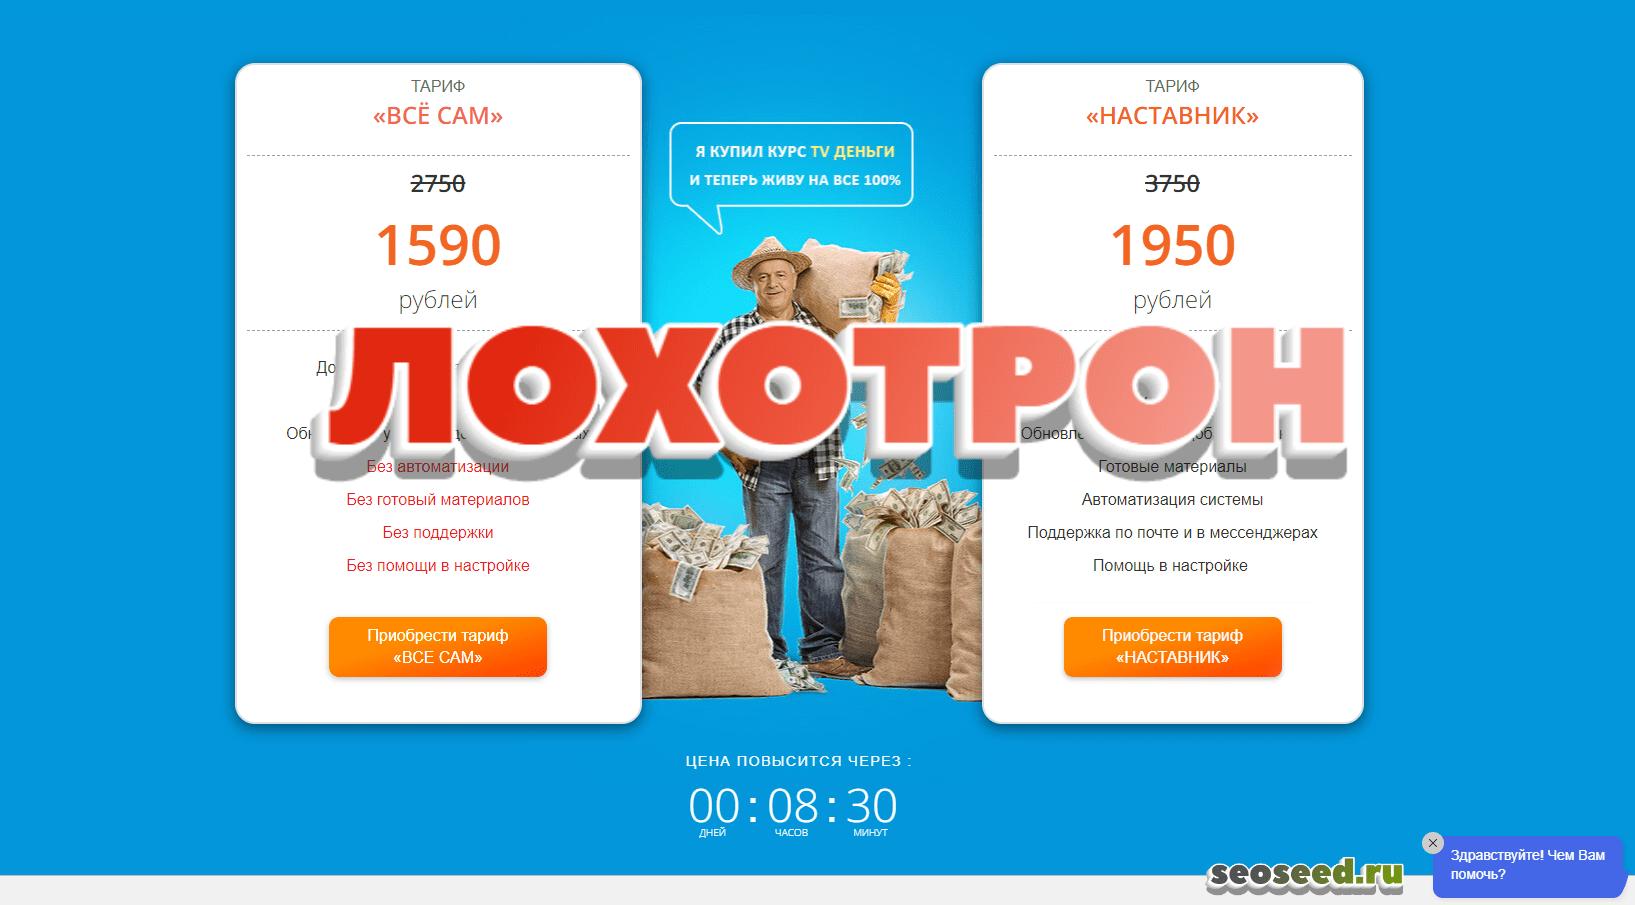 tvmoney.onetopcraft.ru обзор и анализ сайта